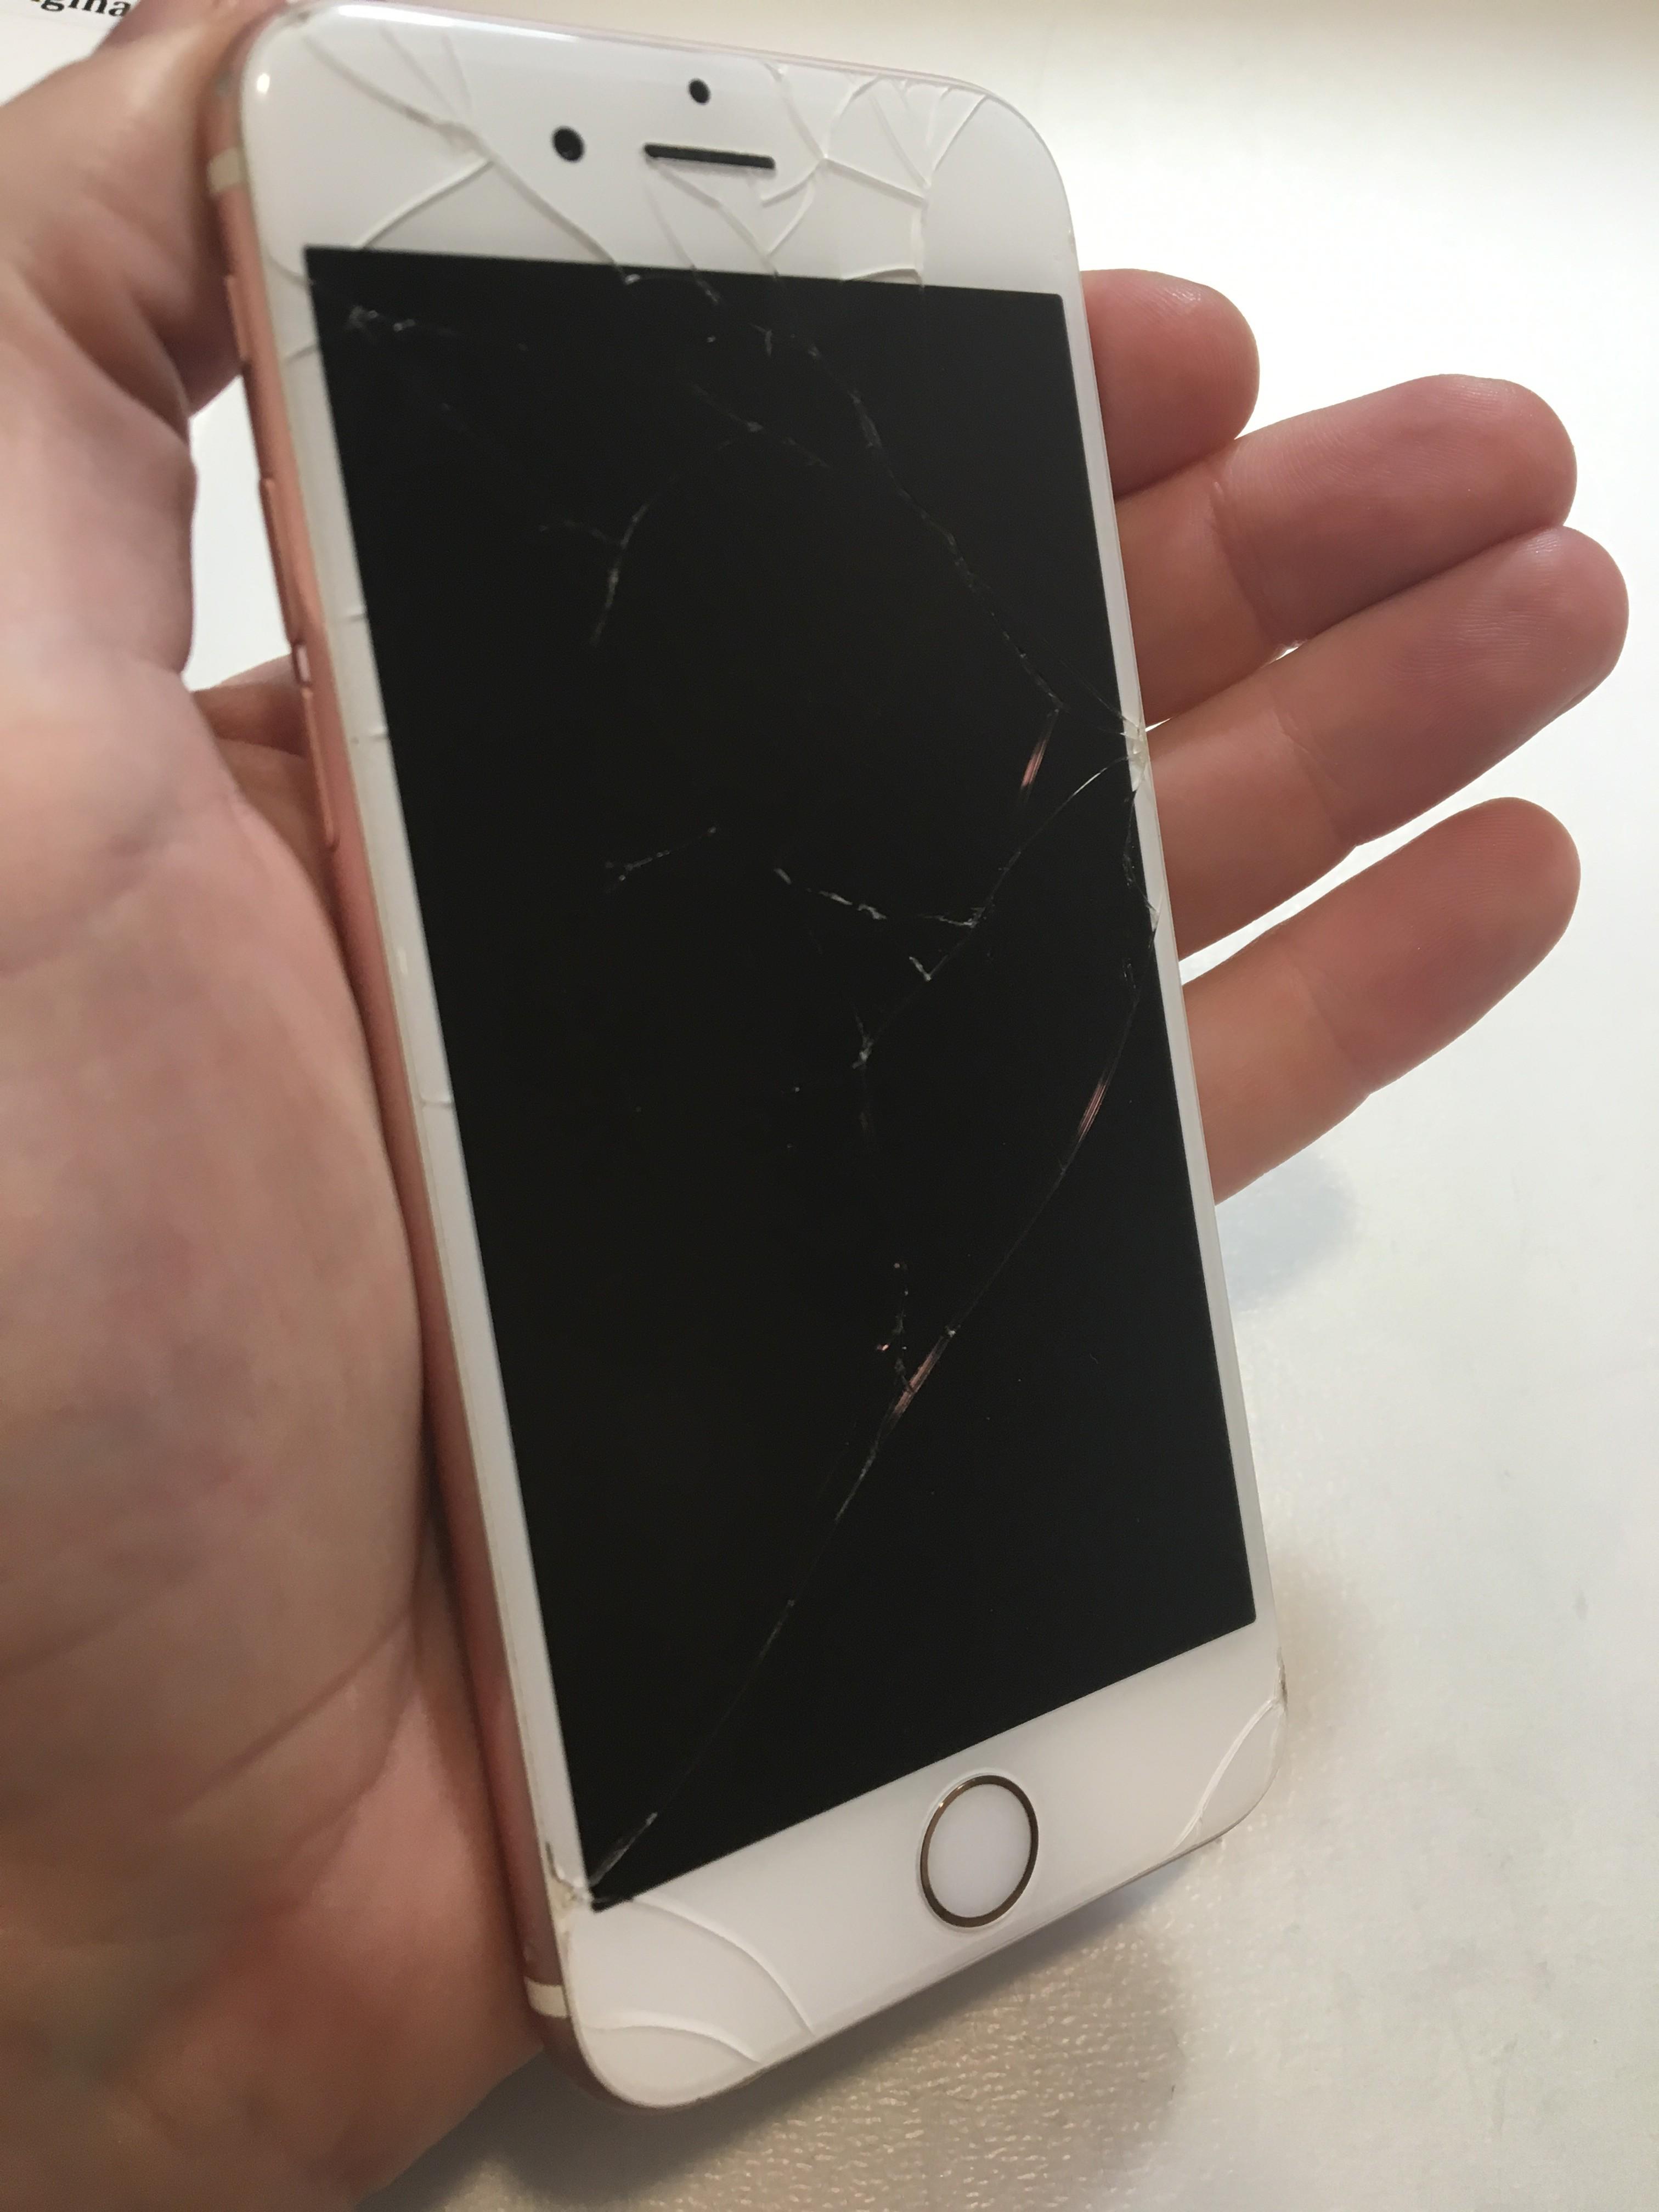 Iphone Screen Repair Course